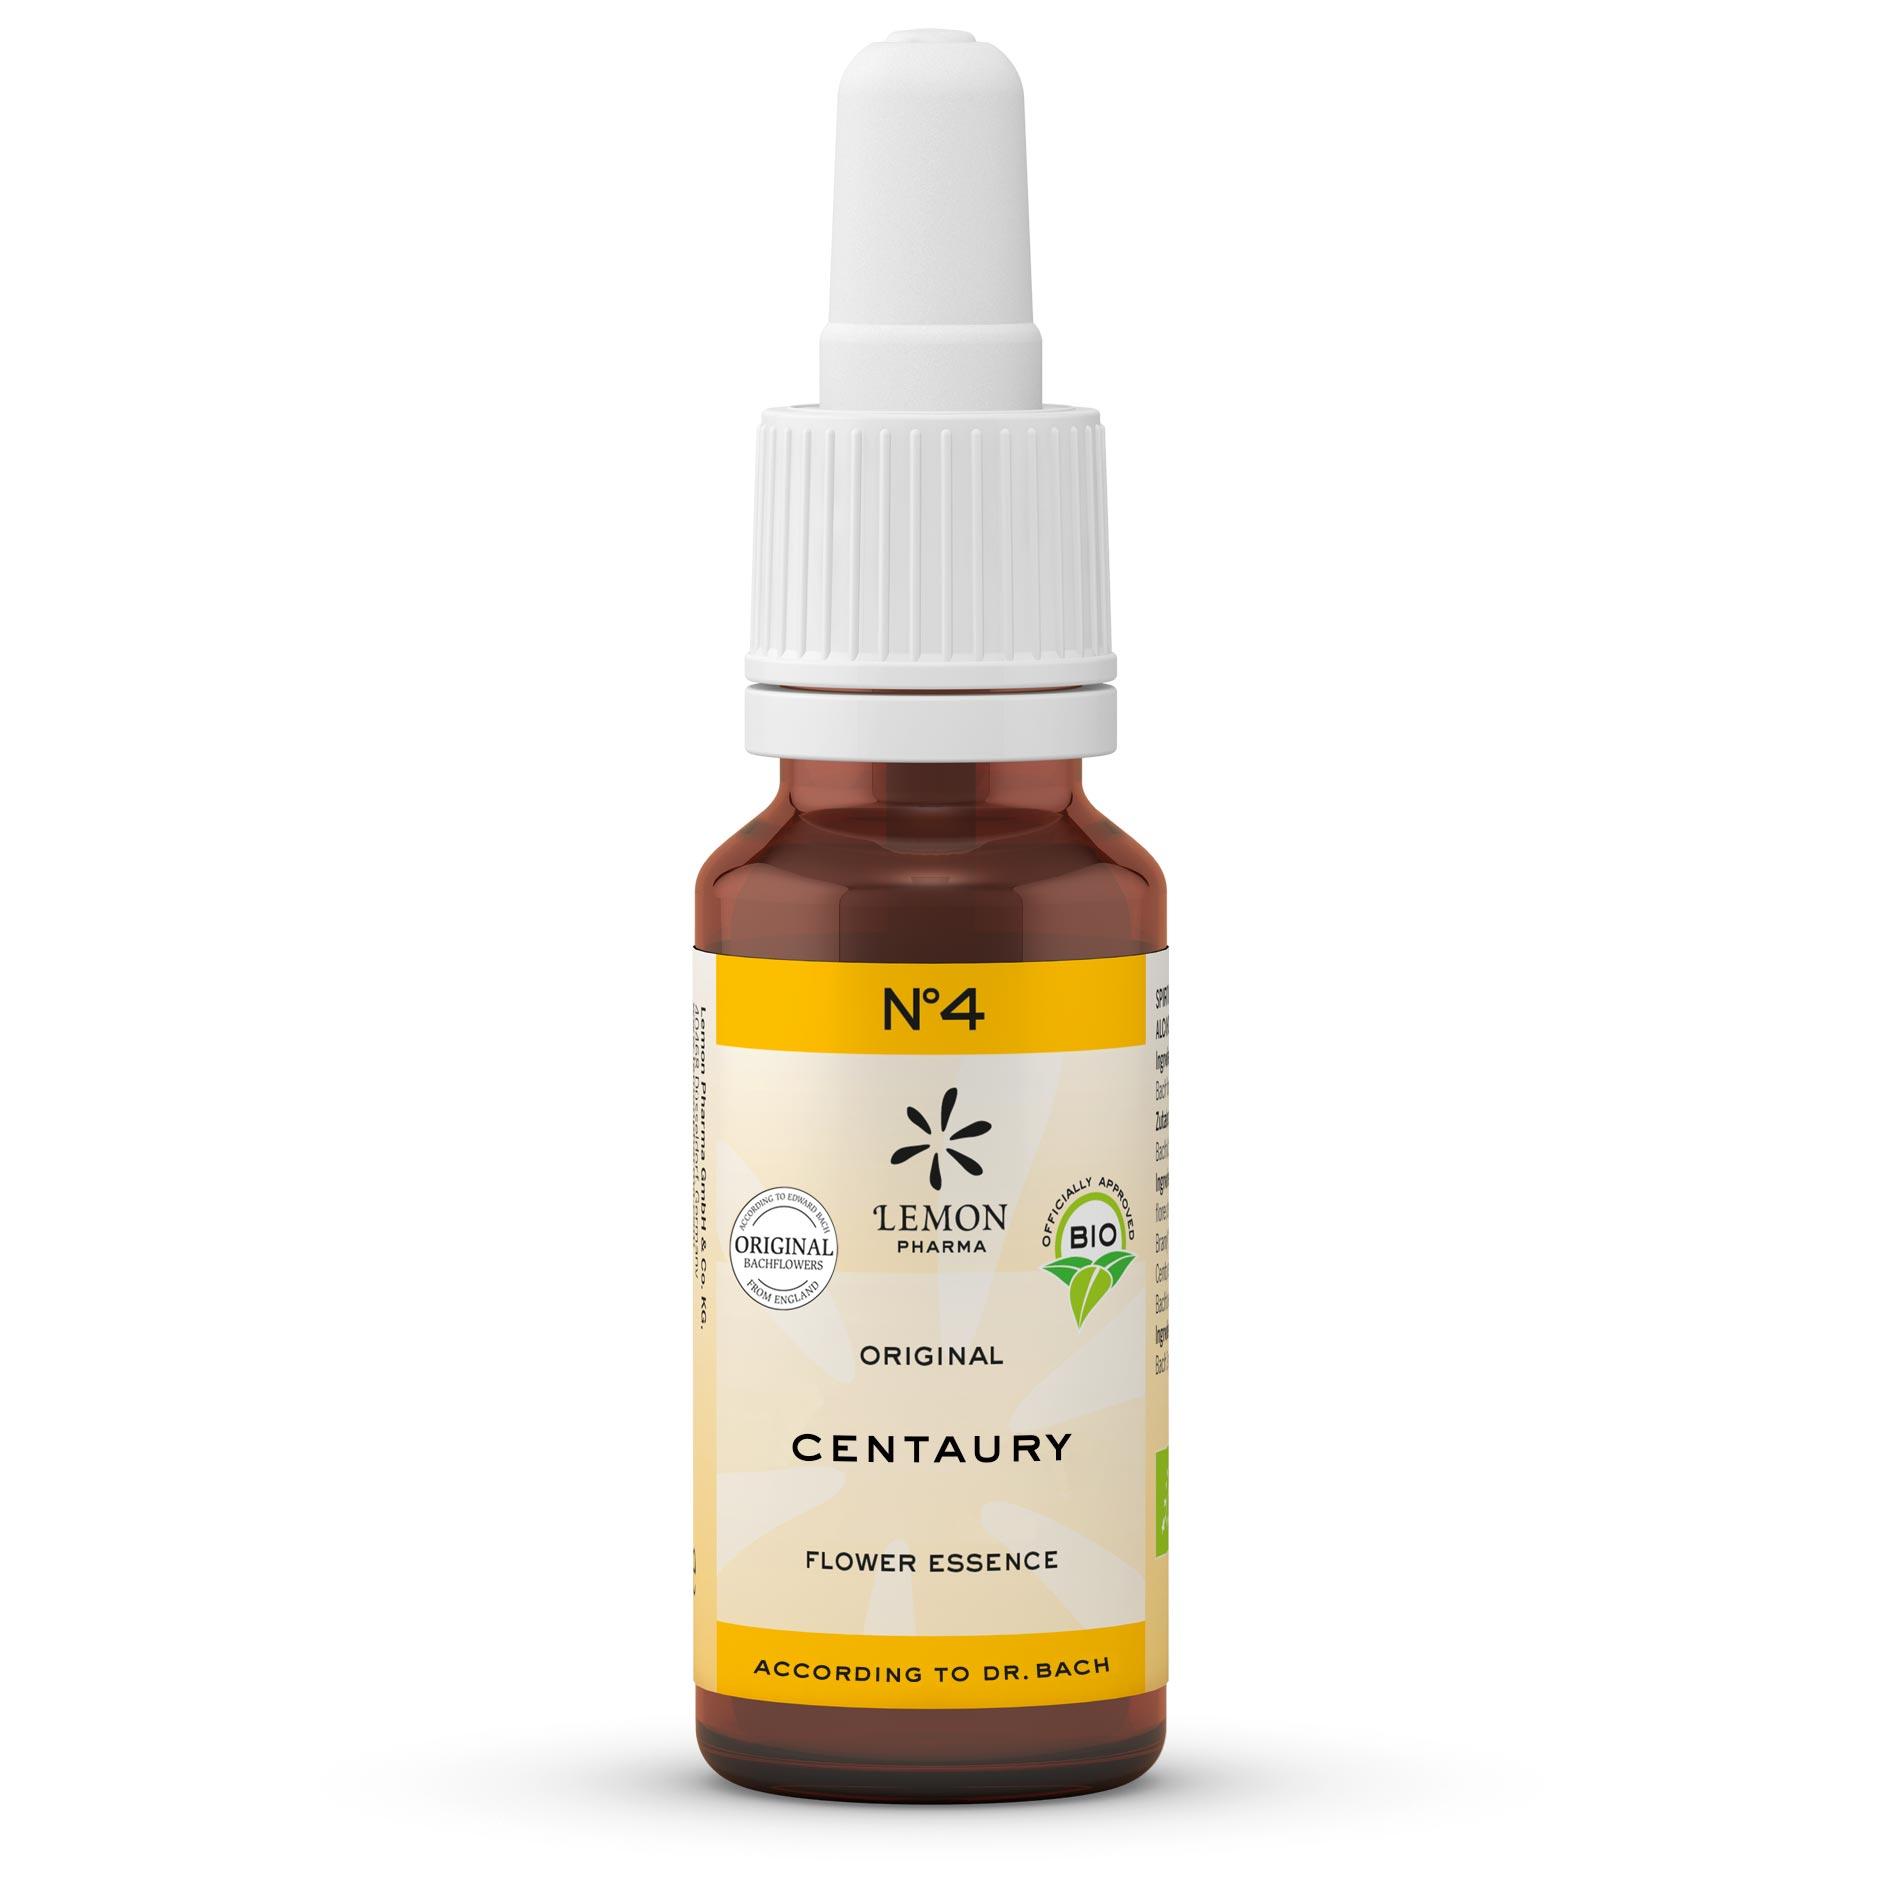 Lemon Pharma Original Bachblüten Tropfen Nr 4 Centaury Tausendgüldenkraut Selbstbehauptungskraft